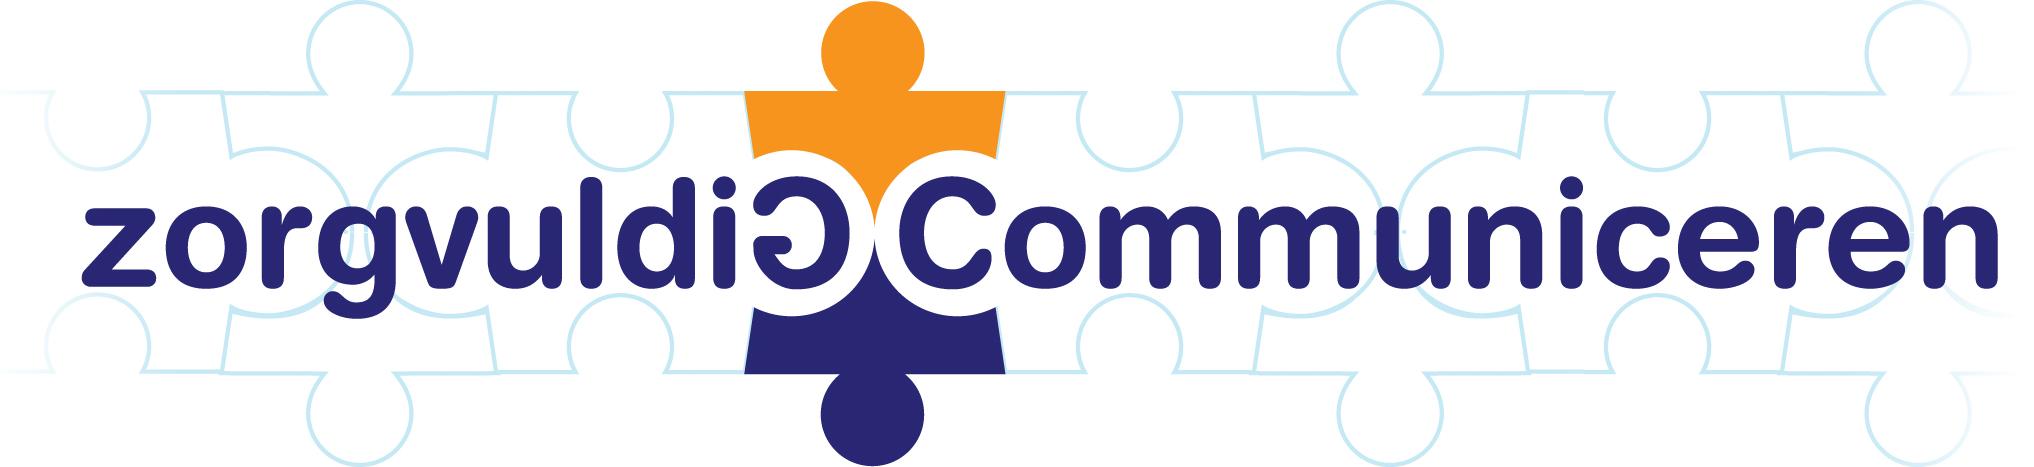 Logo Zorgvuldig communiceren